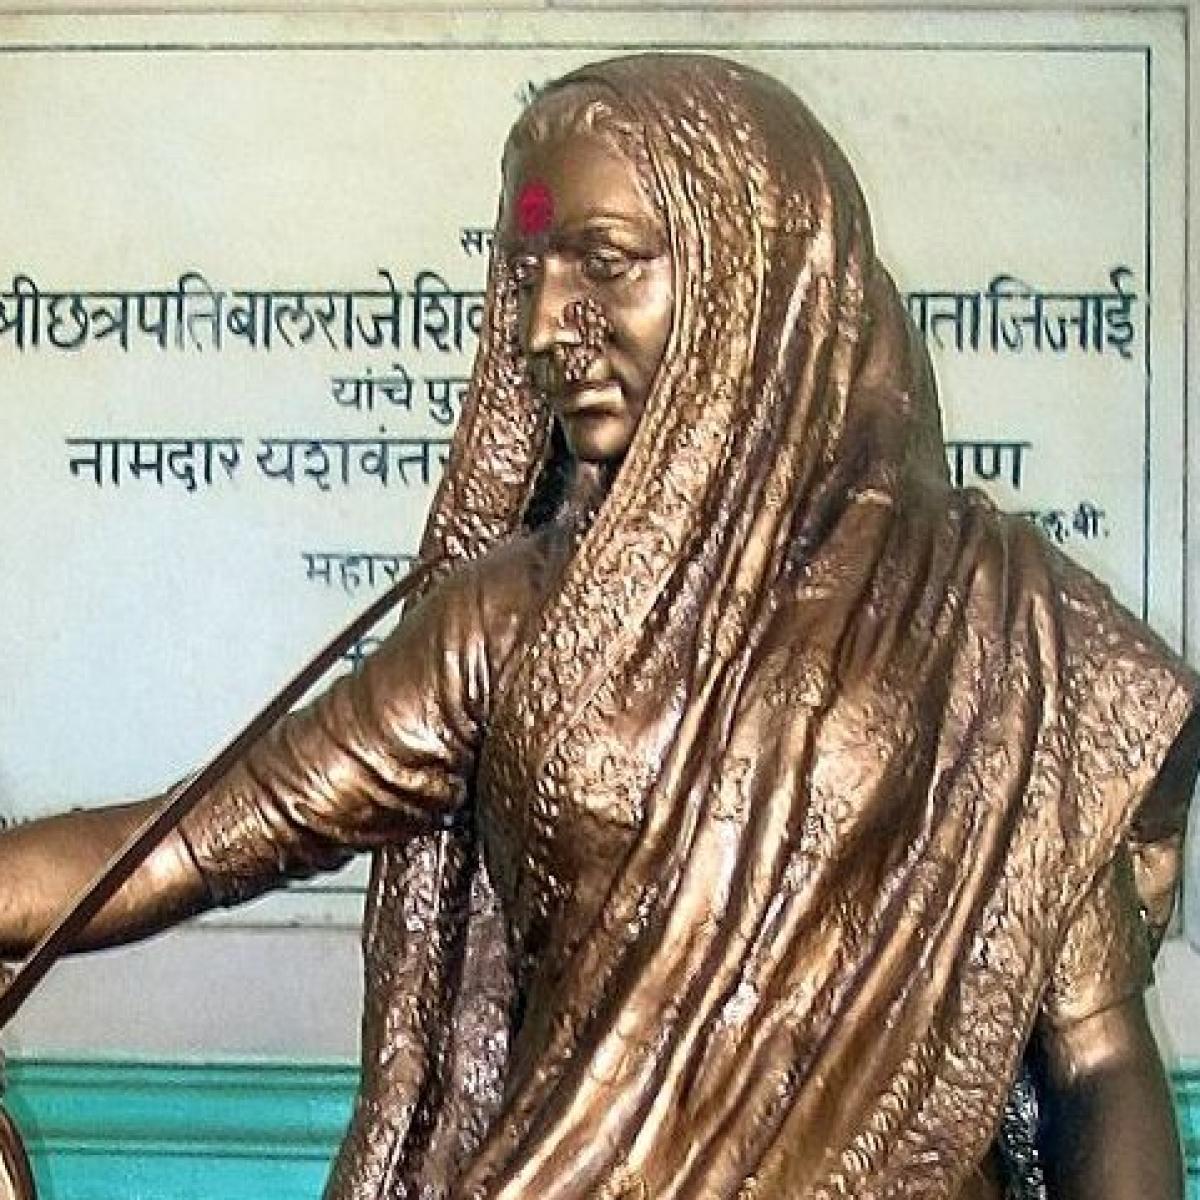 Jijabai Birth Anniversary: Remembering the 'Rajmata' of the Maratha Empire